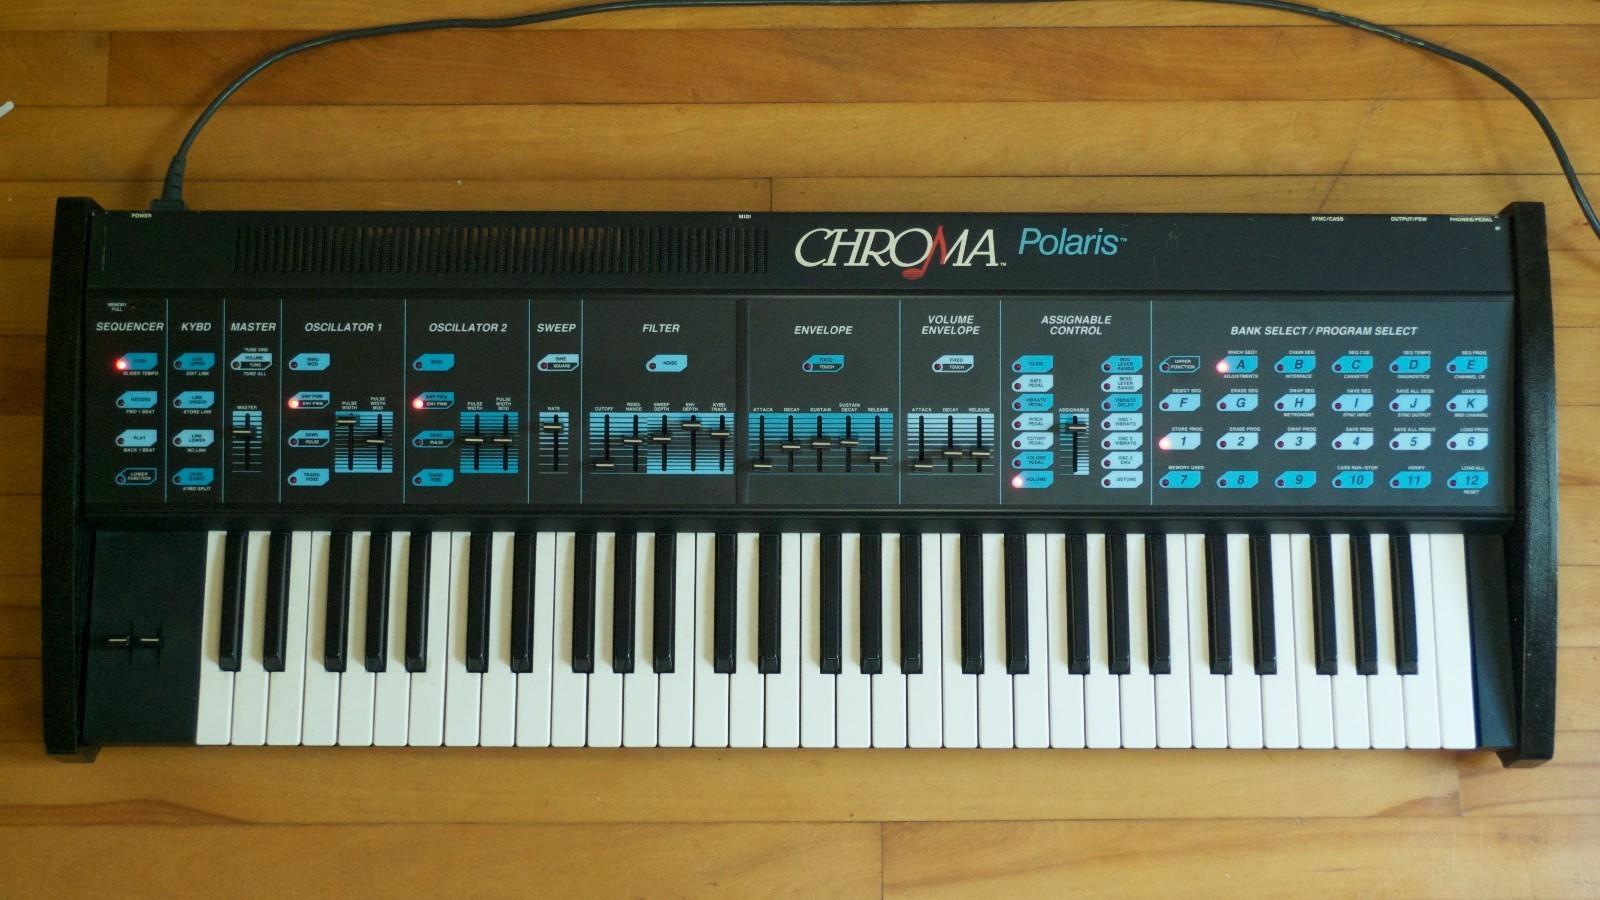 Rhodes chroma polaris manual transmission